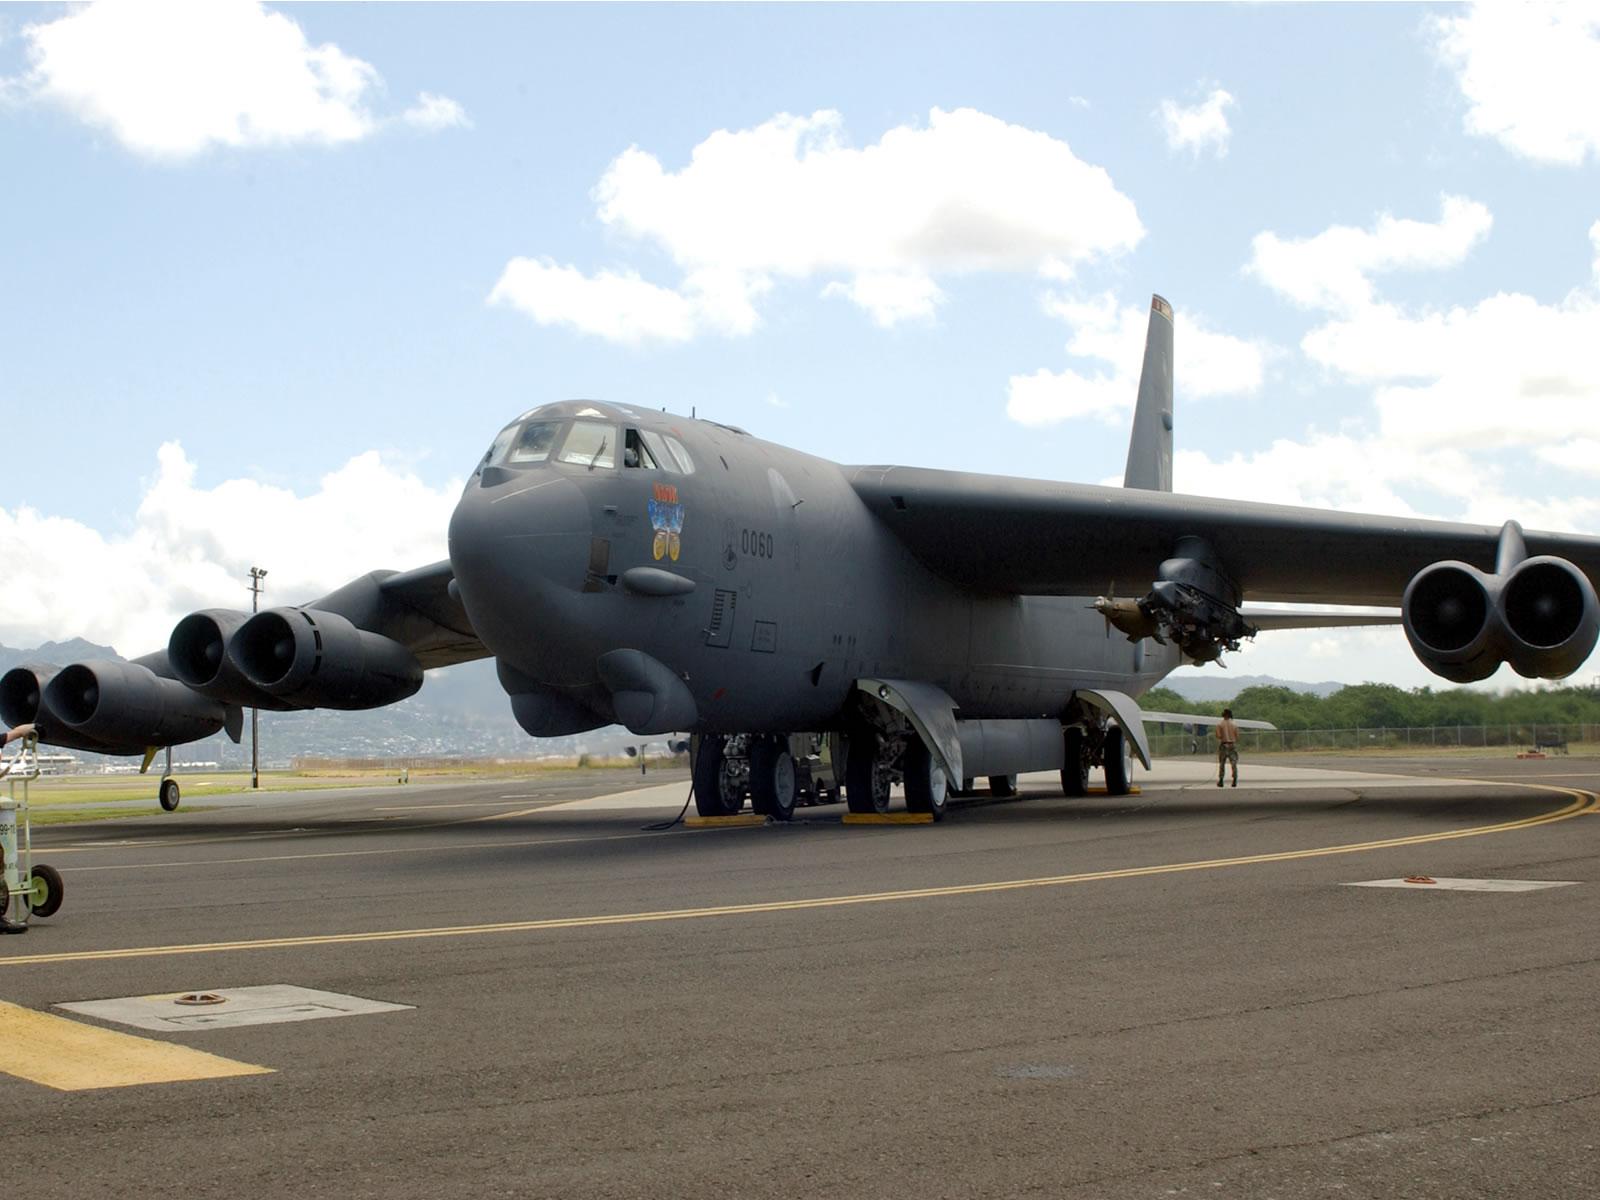 Boeing B52 Stratofortress schwerer Langstreckenbomber